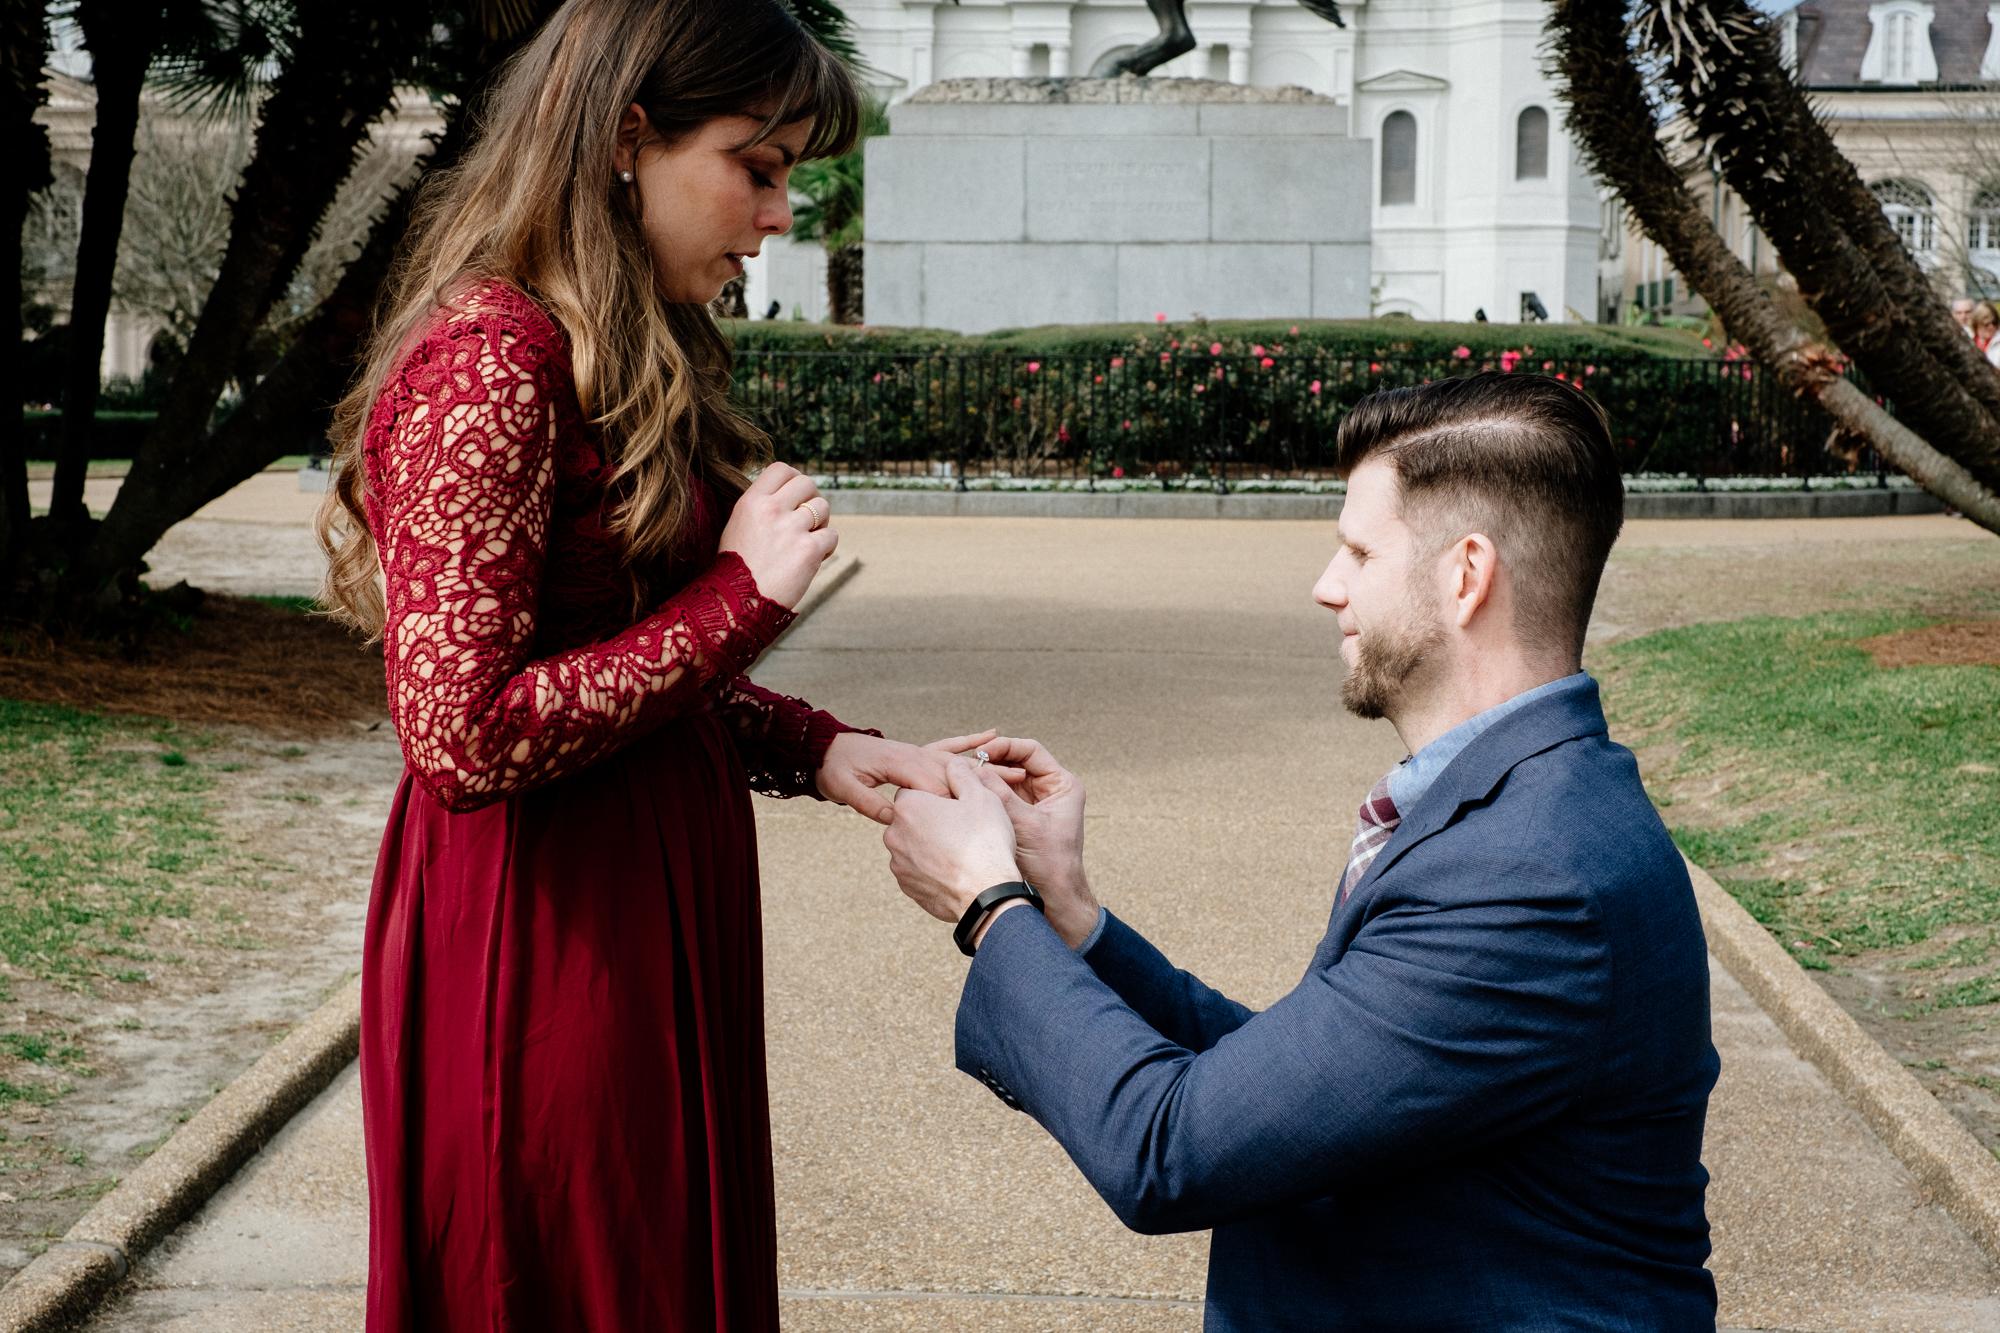 Jen_Montgomery_Photography_Angela_Brian_Engagement_Proposal_FB-13.jpg